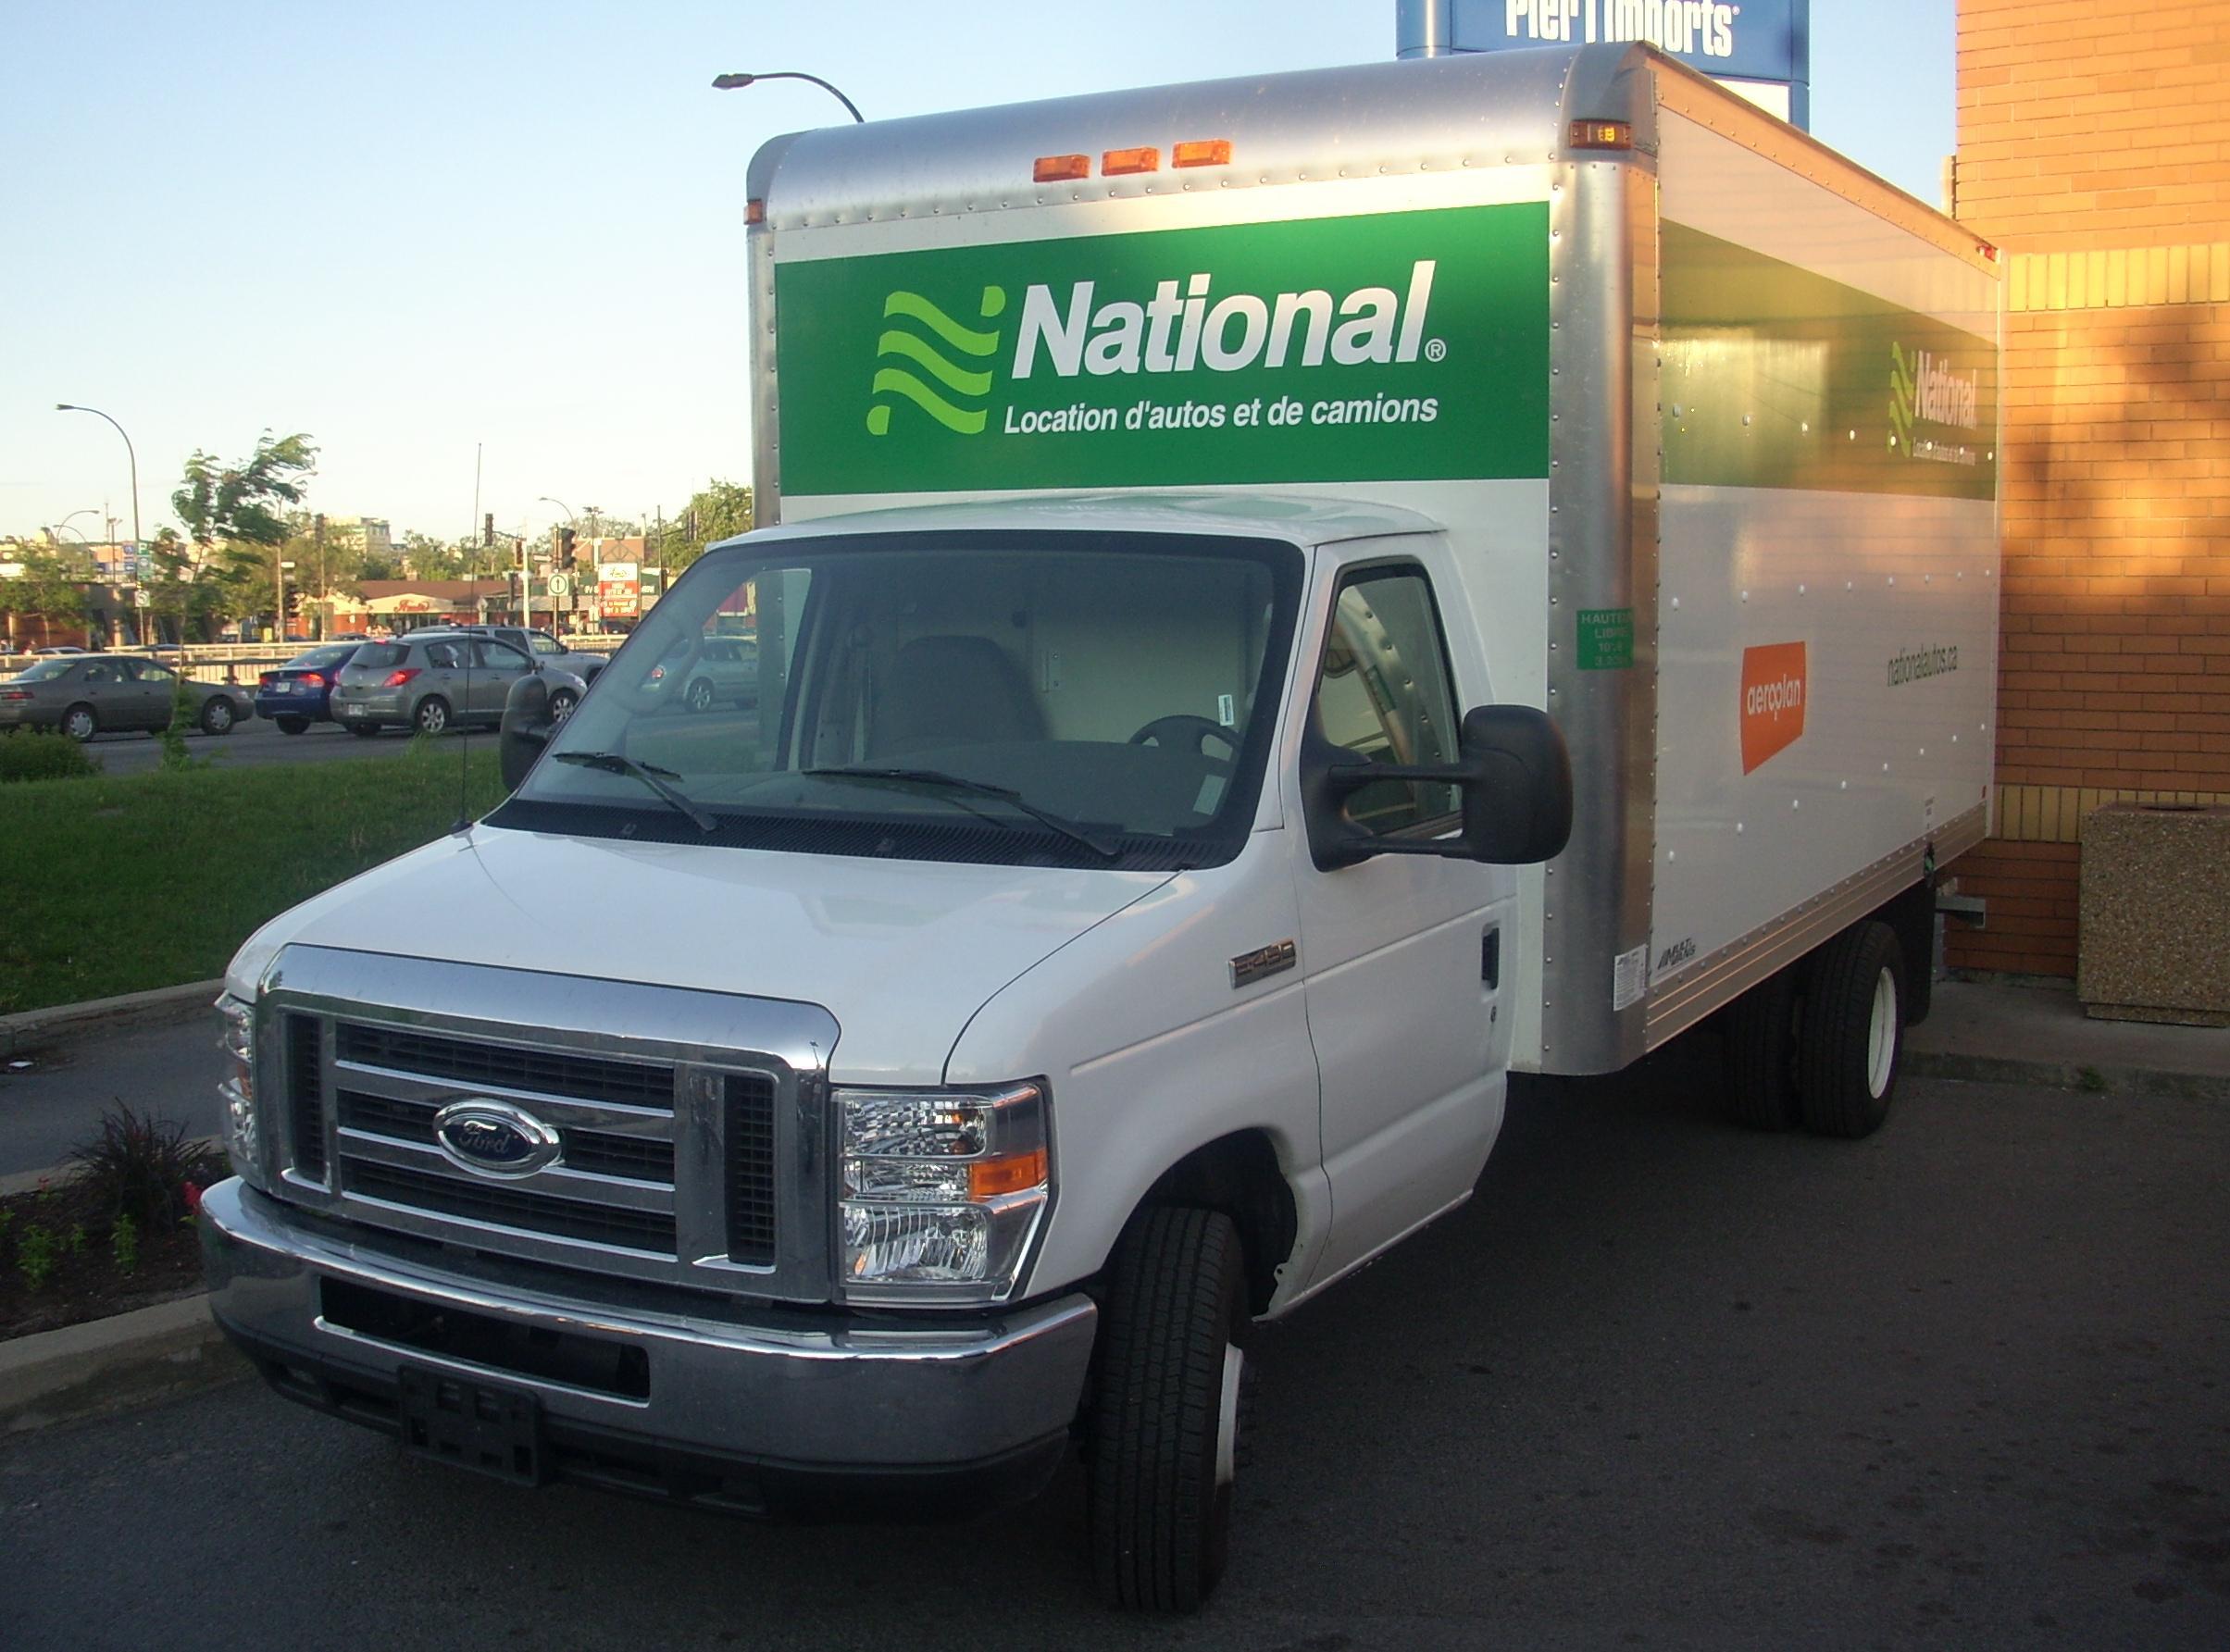 National car rental coupons and discounts